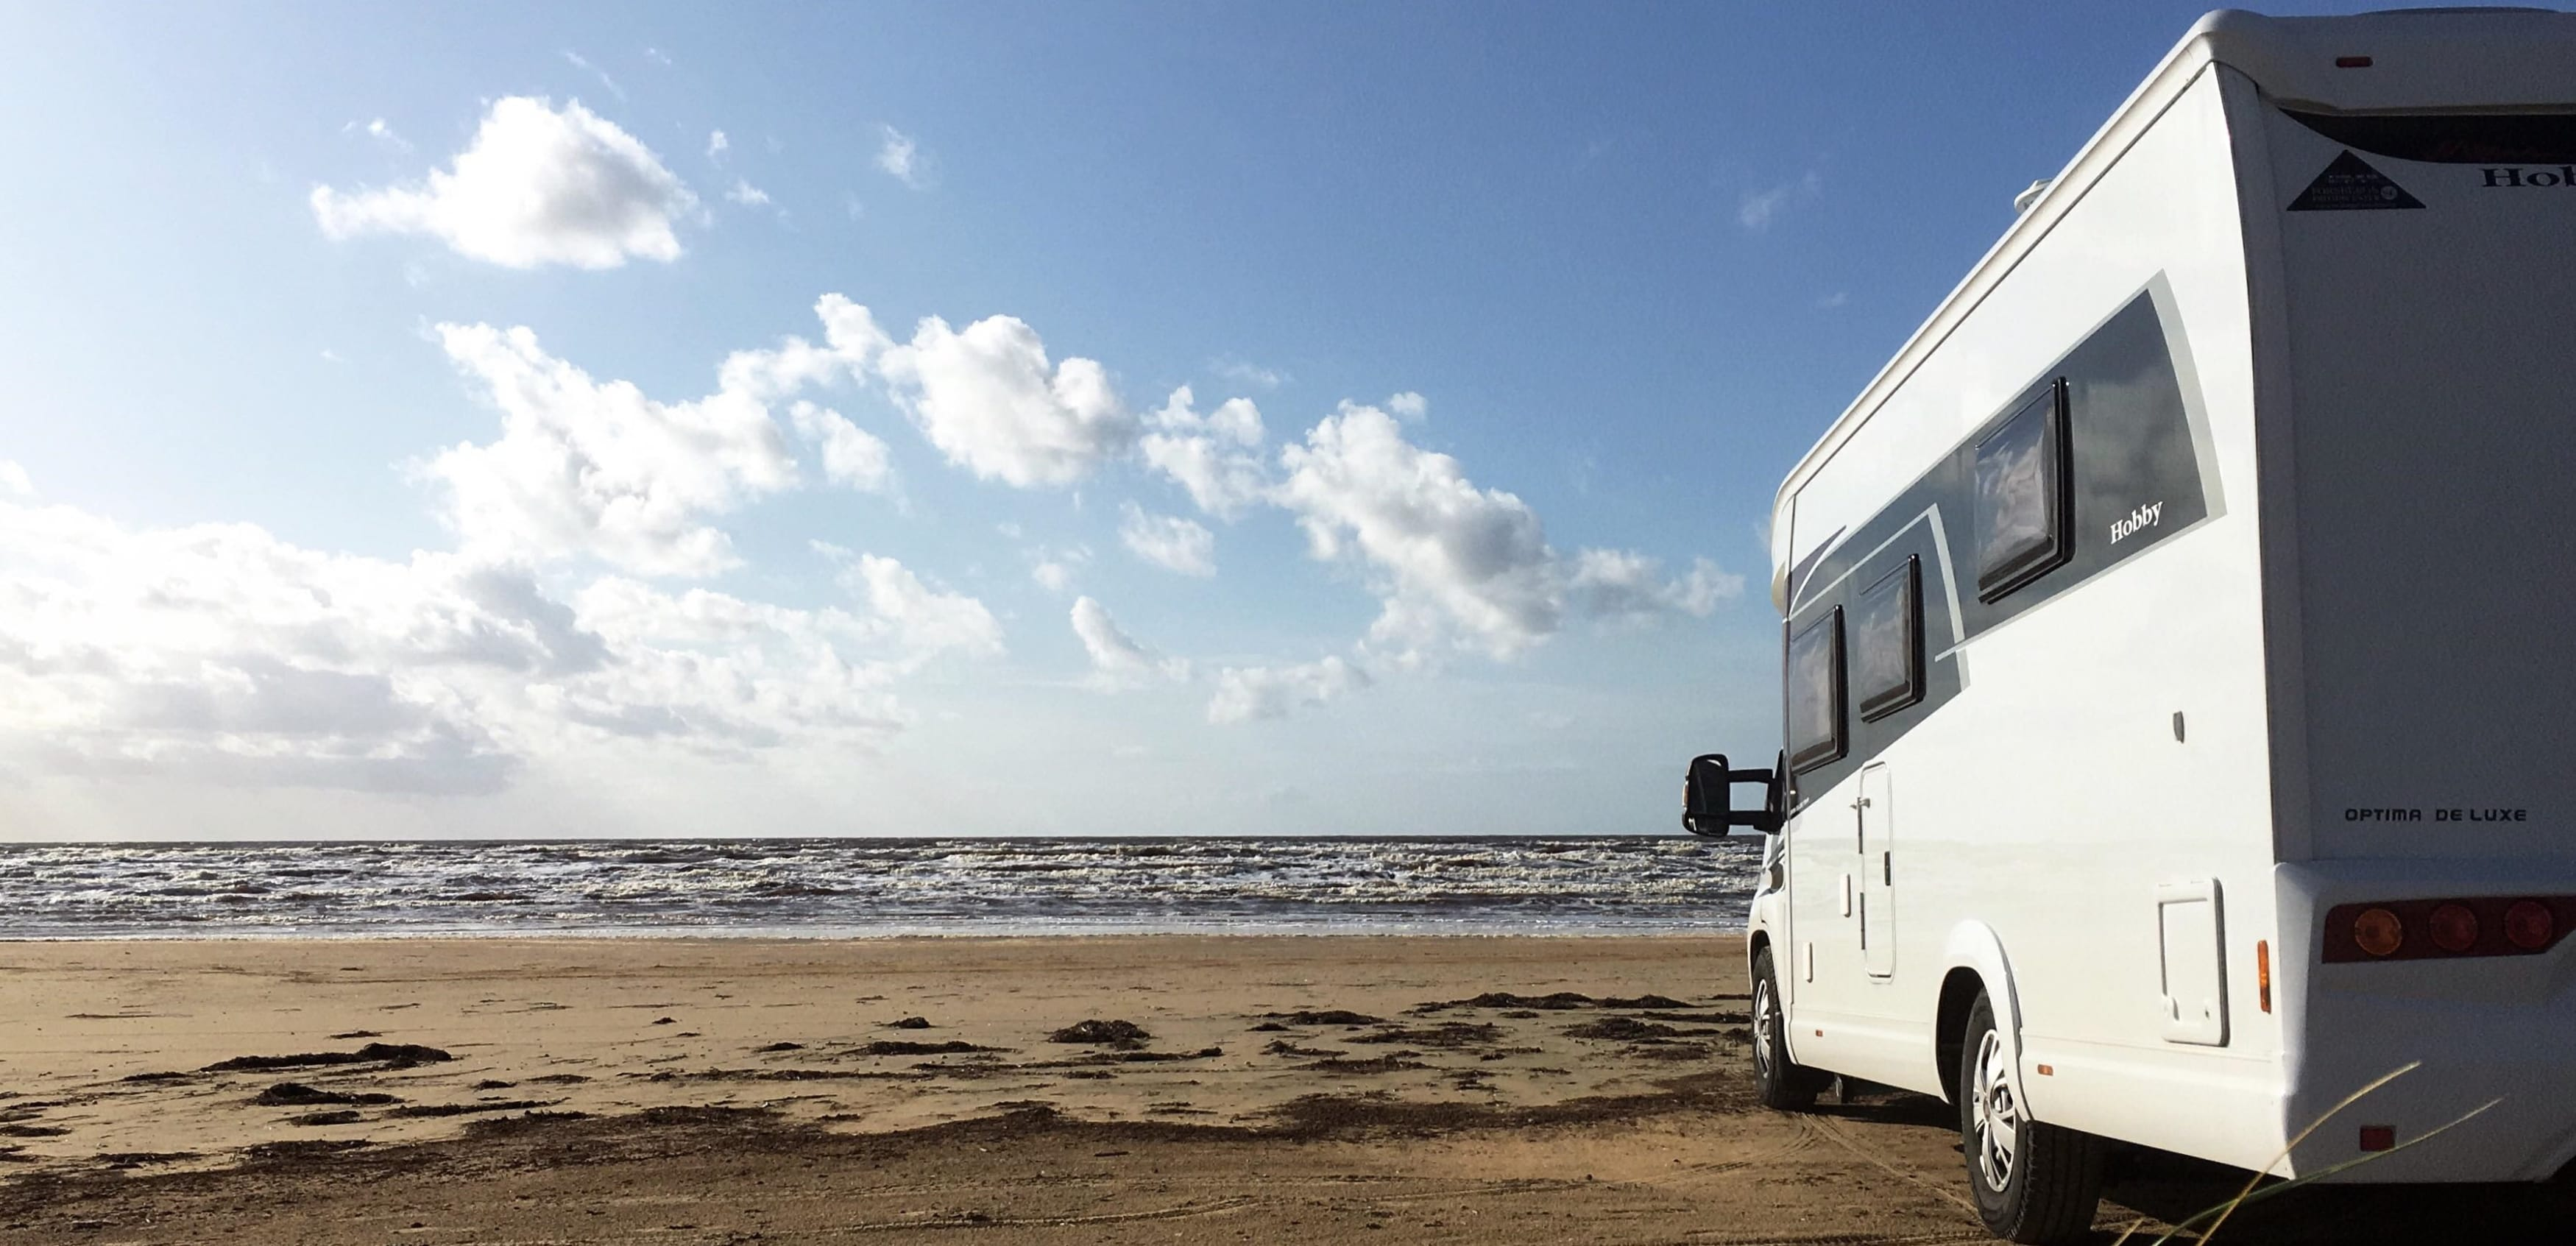 Uffes husbil på stranden